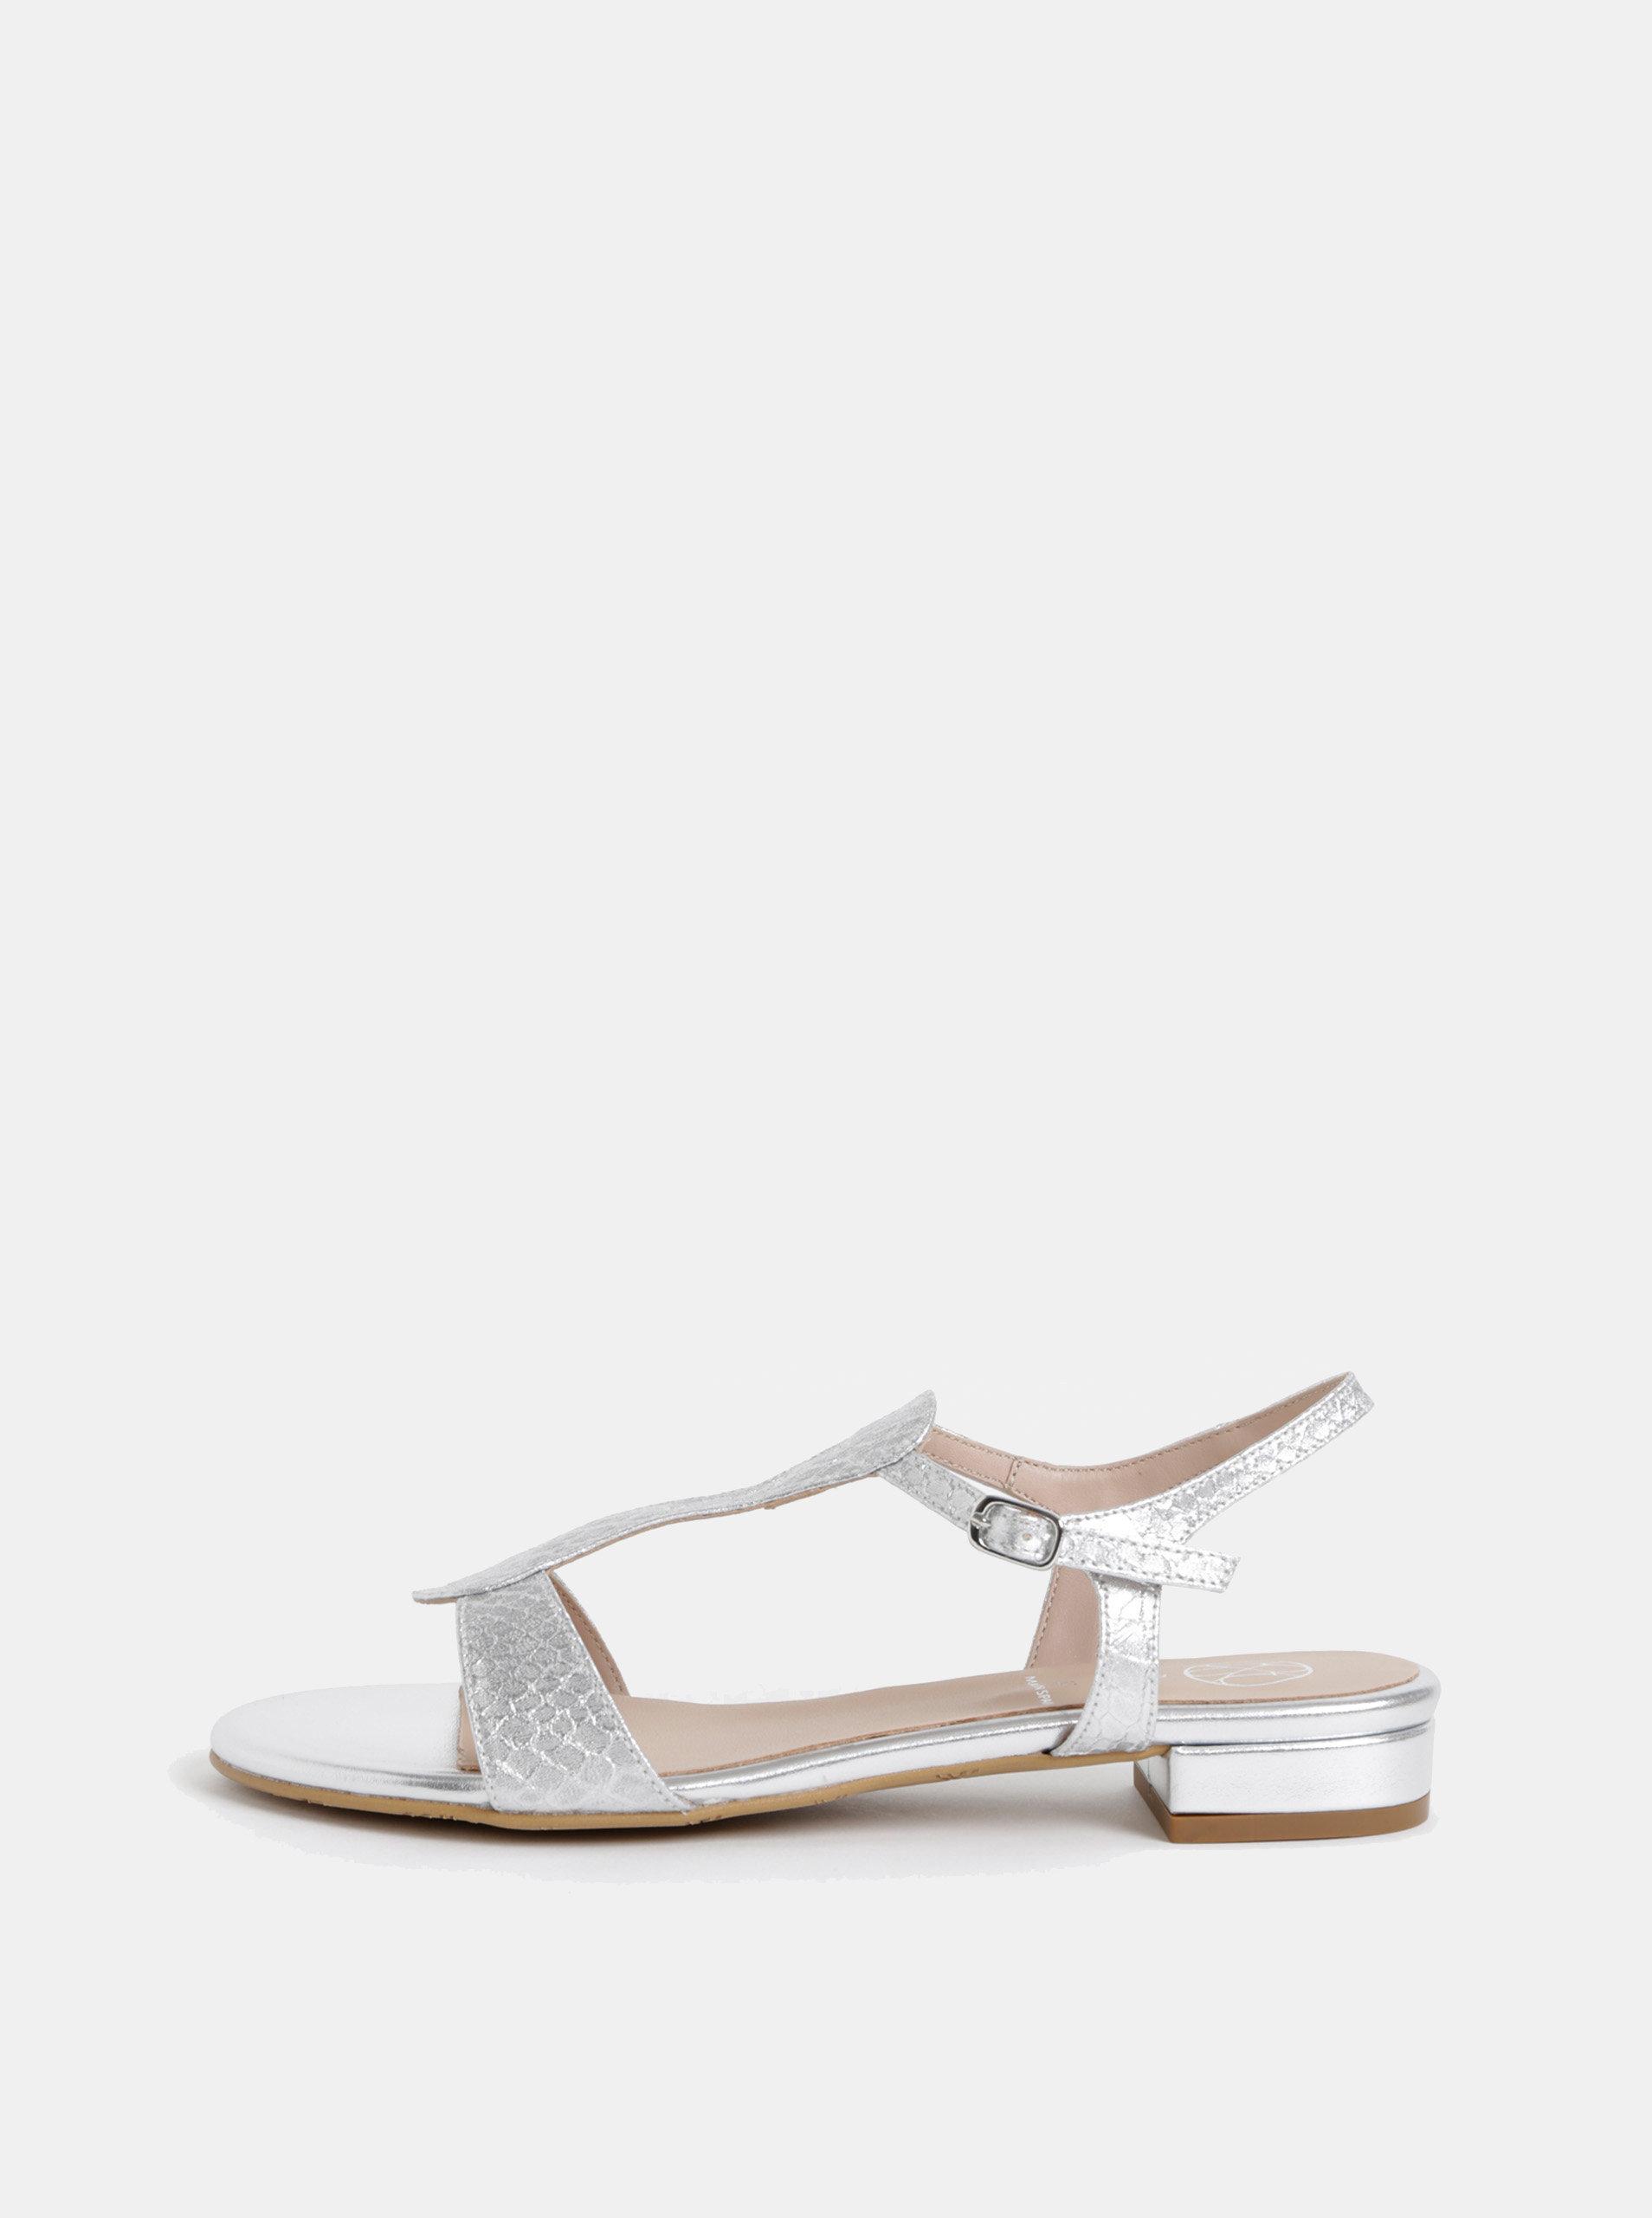 4d978b49c Sandále v striebornej farbe s hadím vzorom OJJU Marsella | ZOOT.sk